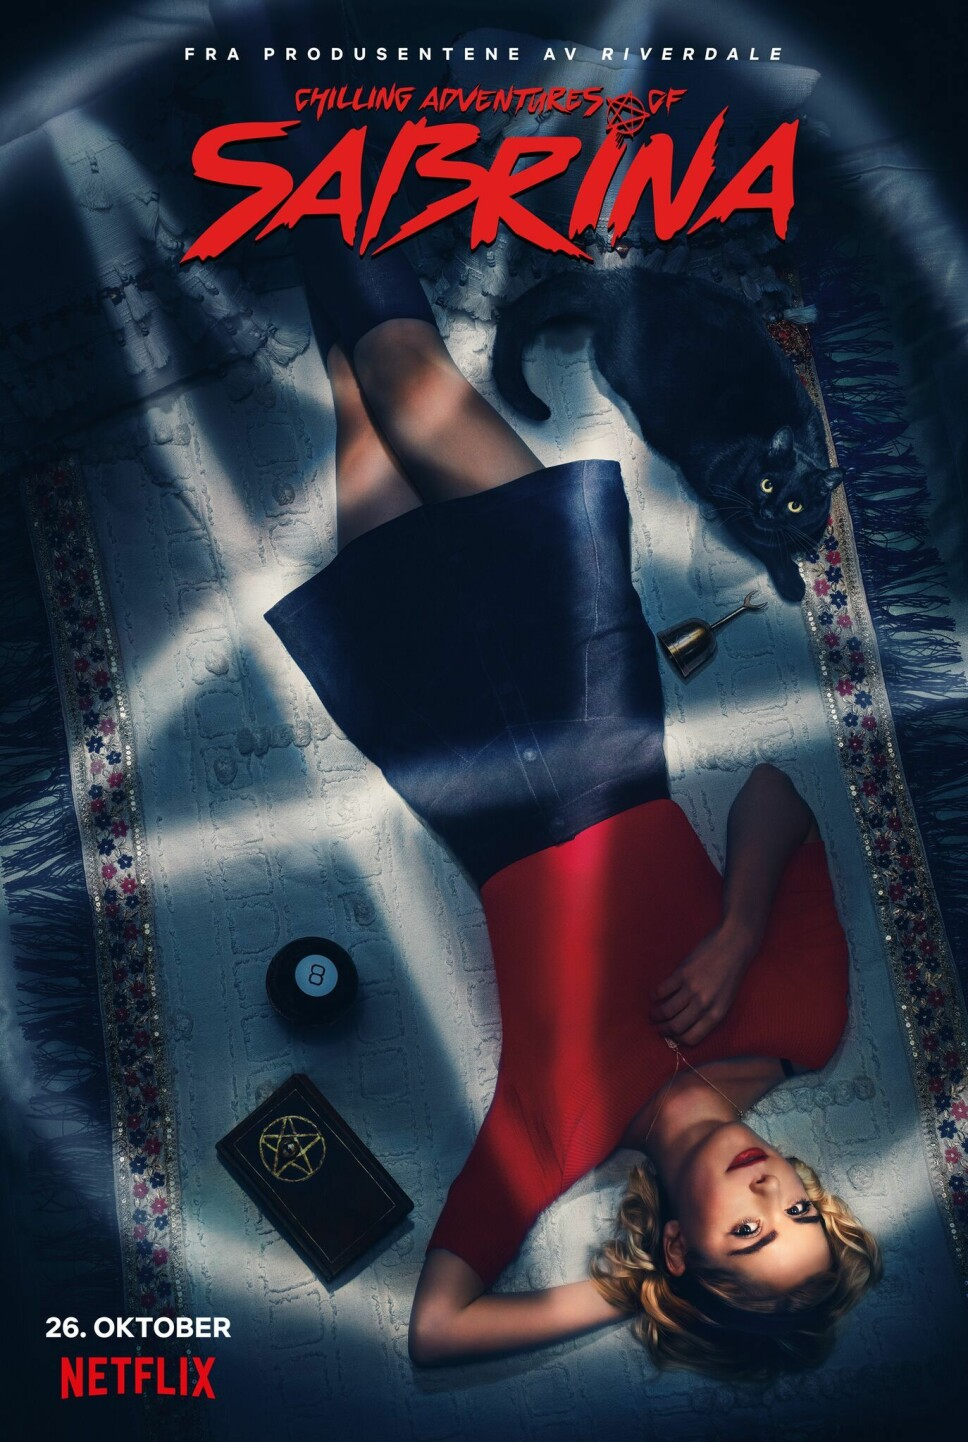 PREMIERE HALLOWEENHELGEN: The Chilling Adventures of Sabrina har premiere fredag 26. oktober, altså helgen før halloween. Her reklameplakaten for serien.